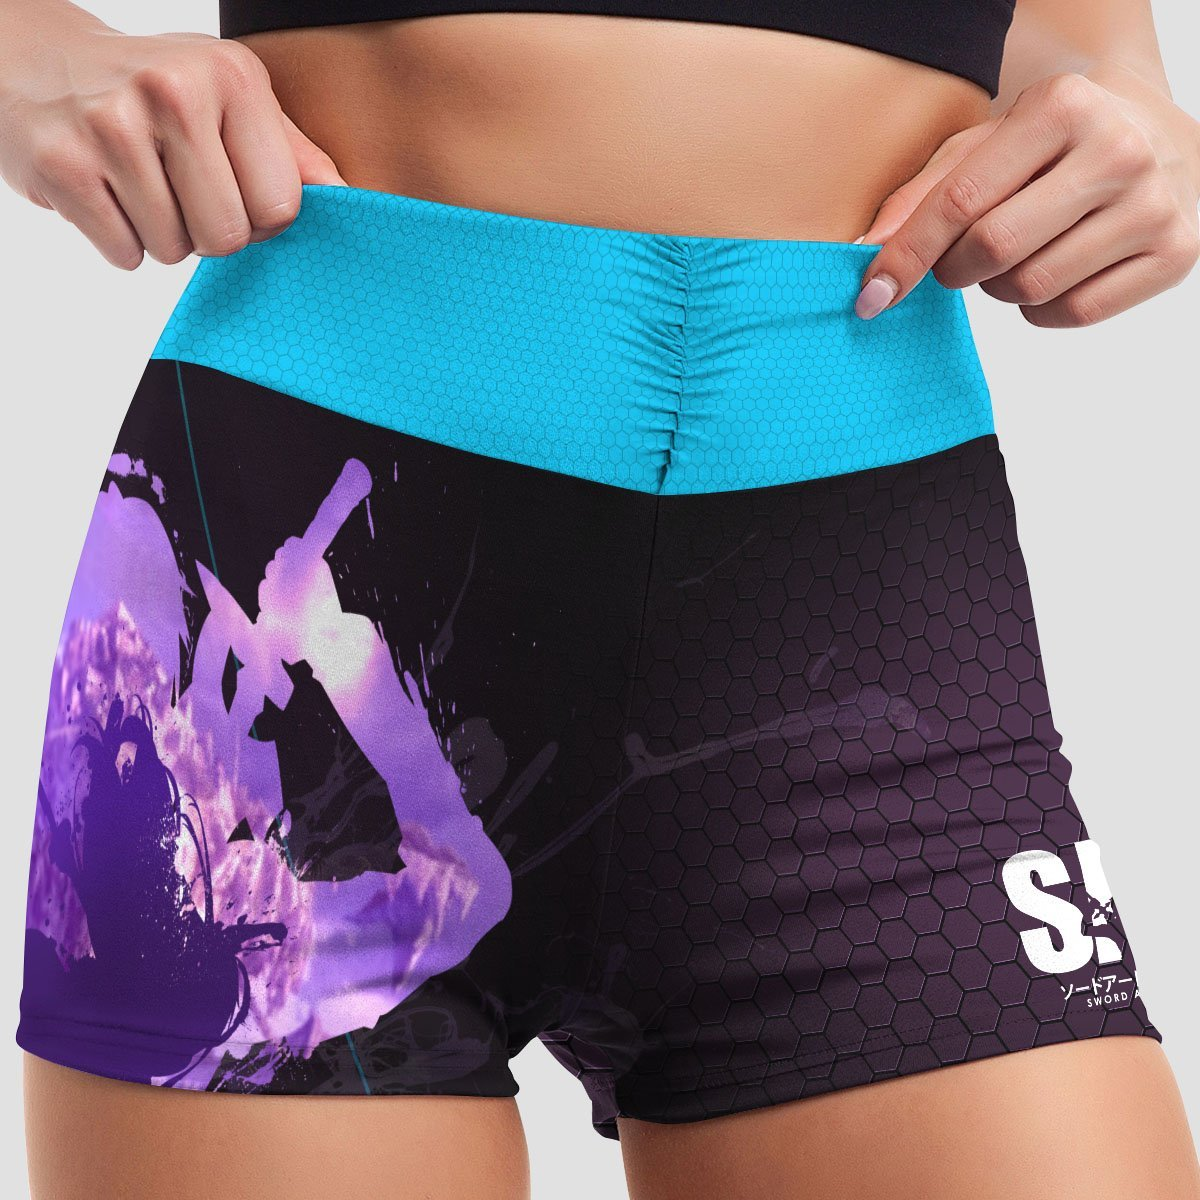 sao summer active wear set 146466 - Anime Swimsuits